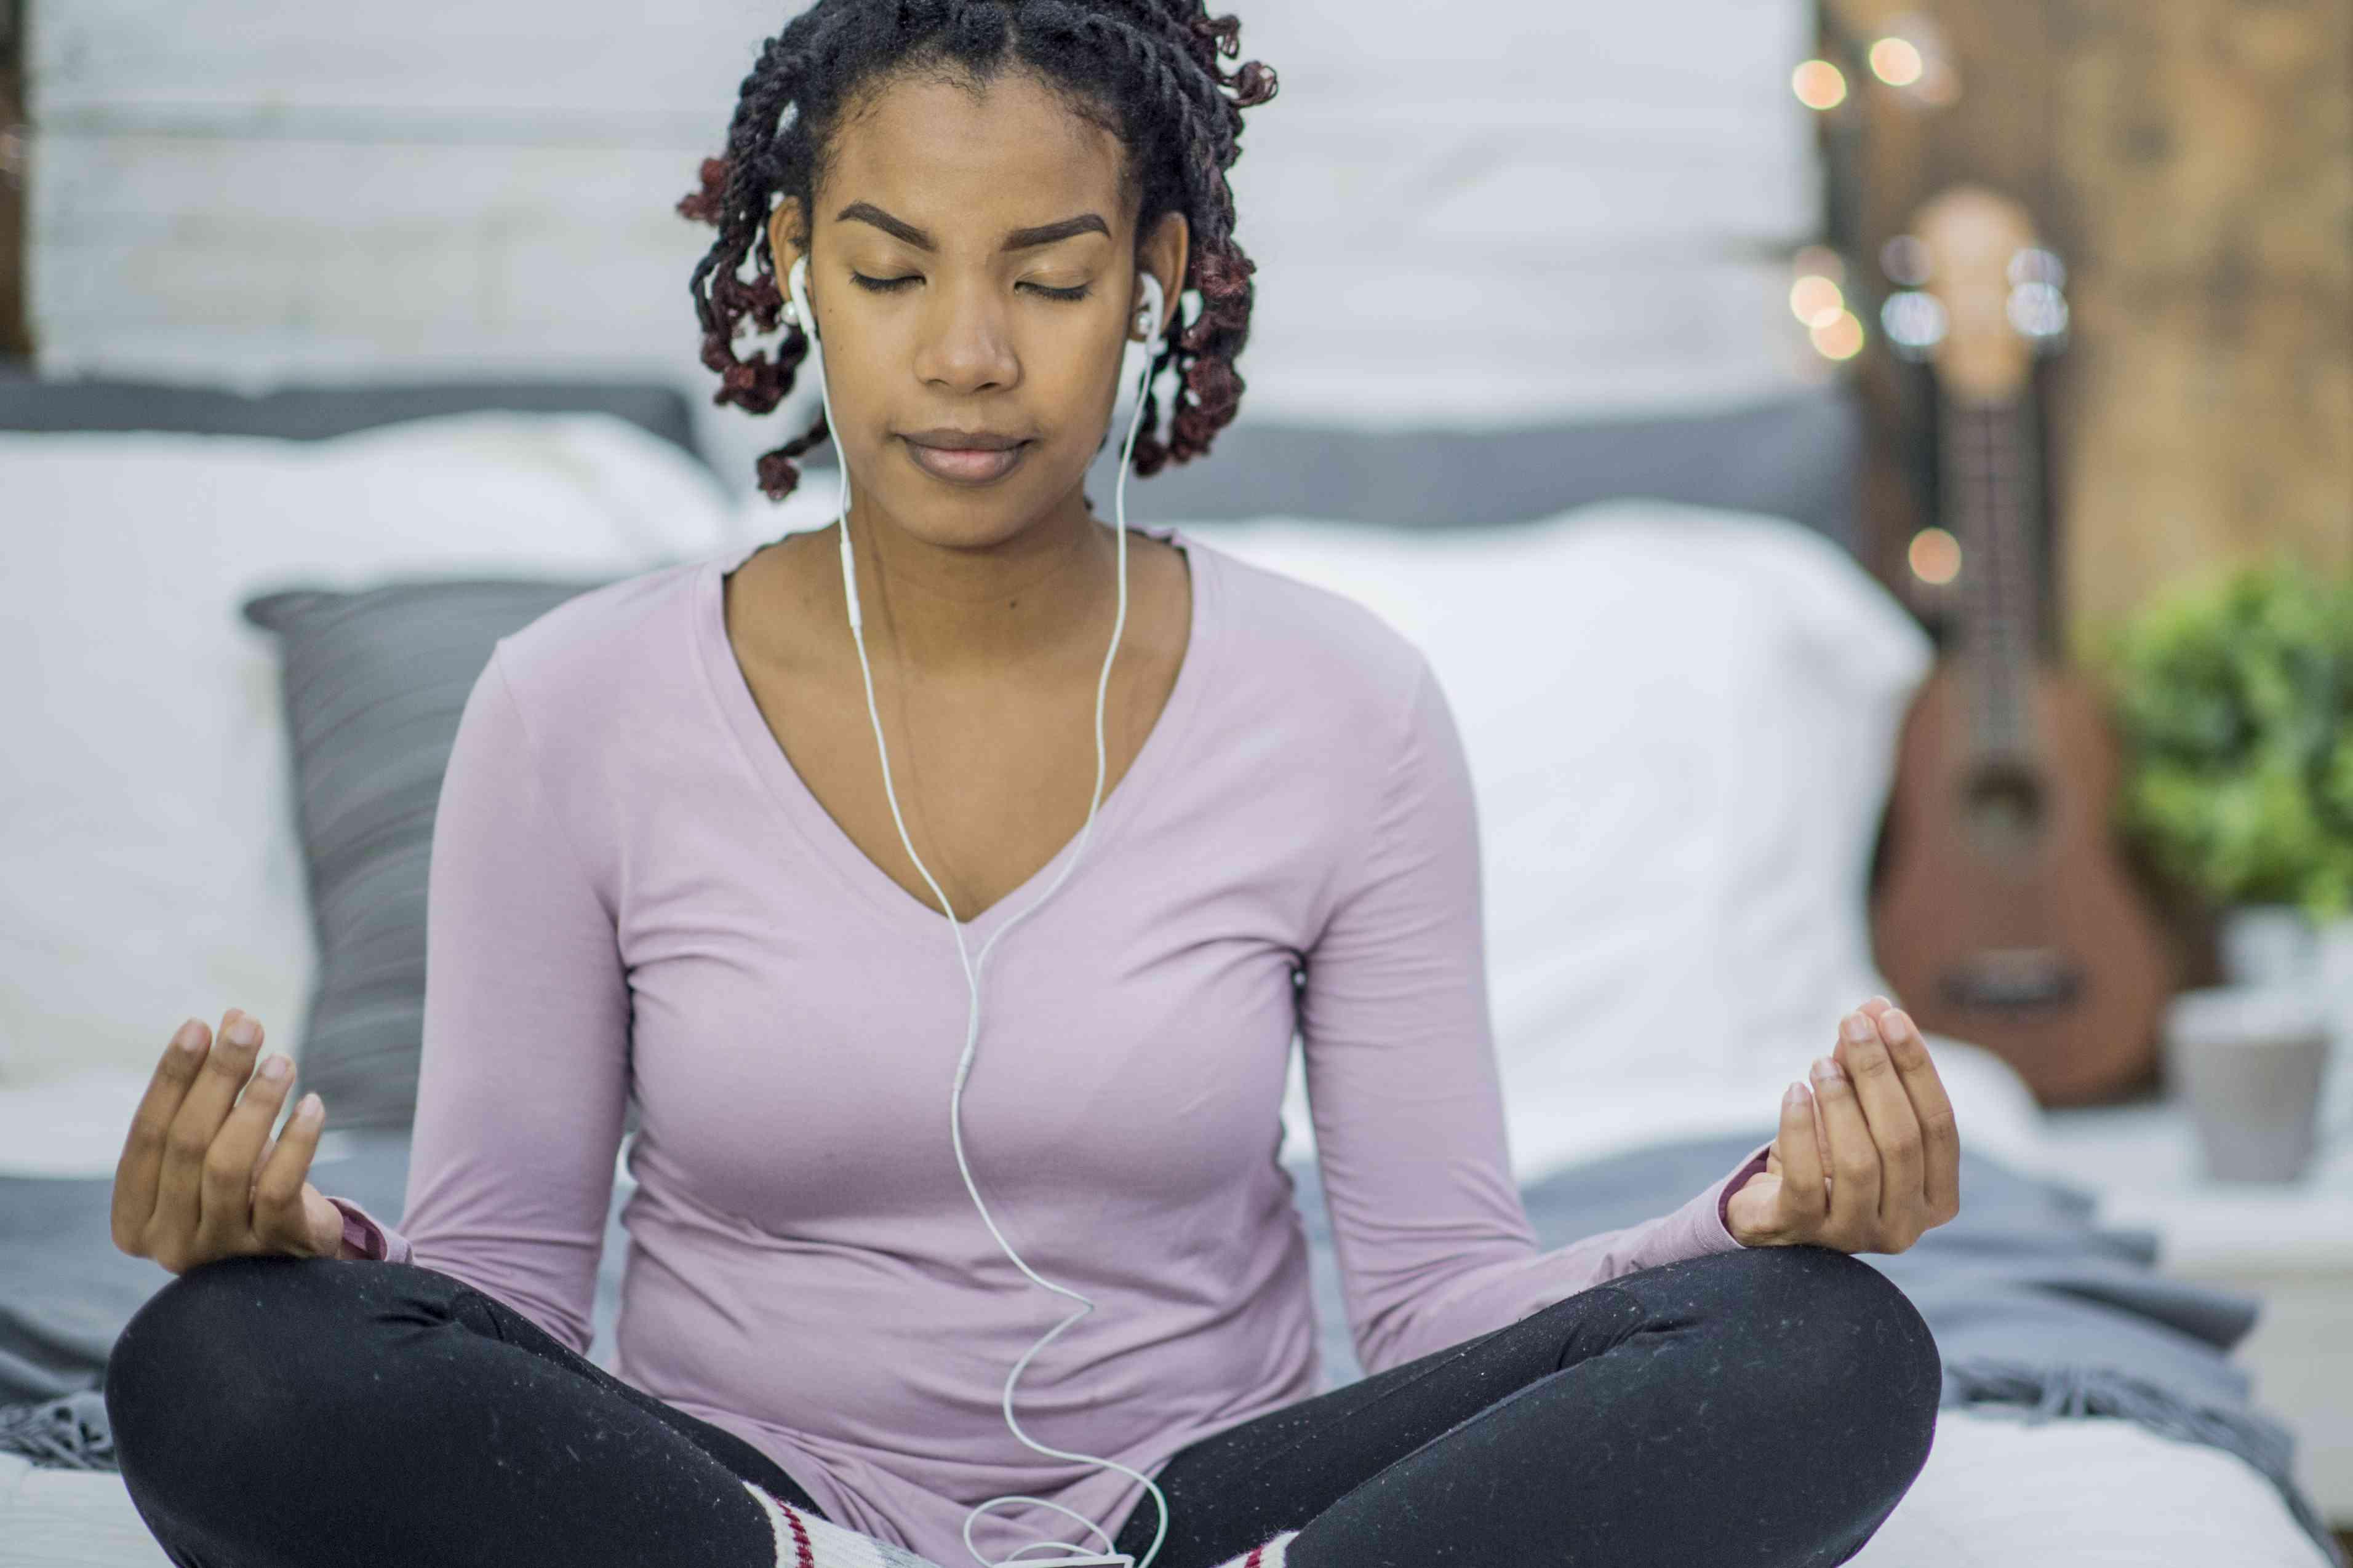 Woman meditating wearing headphones